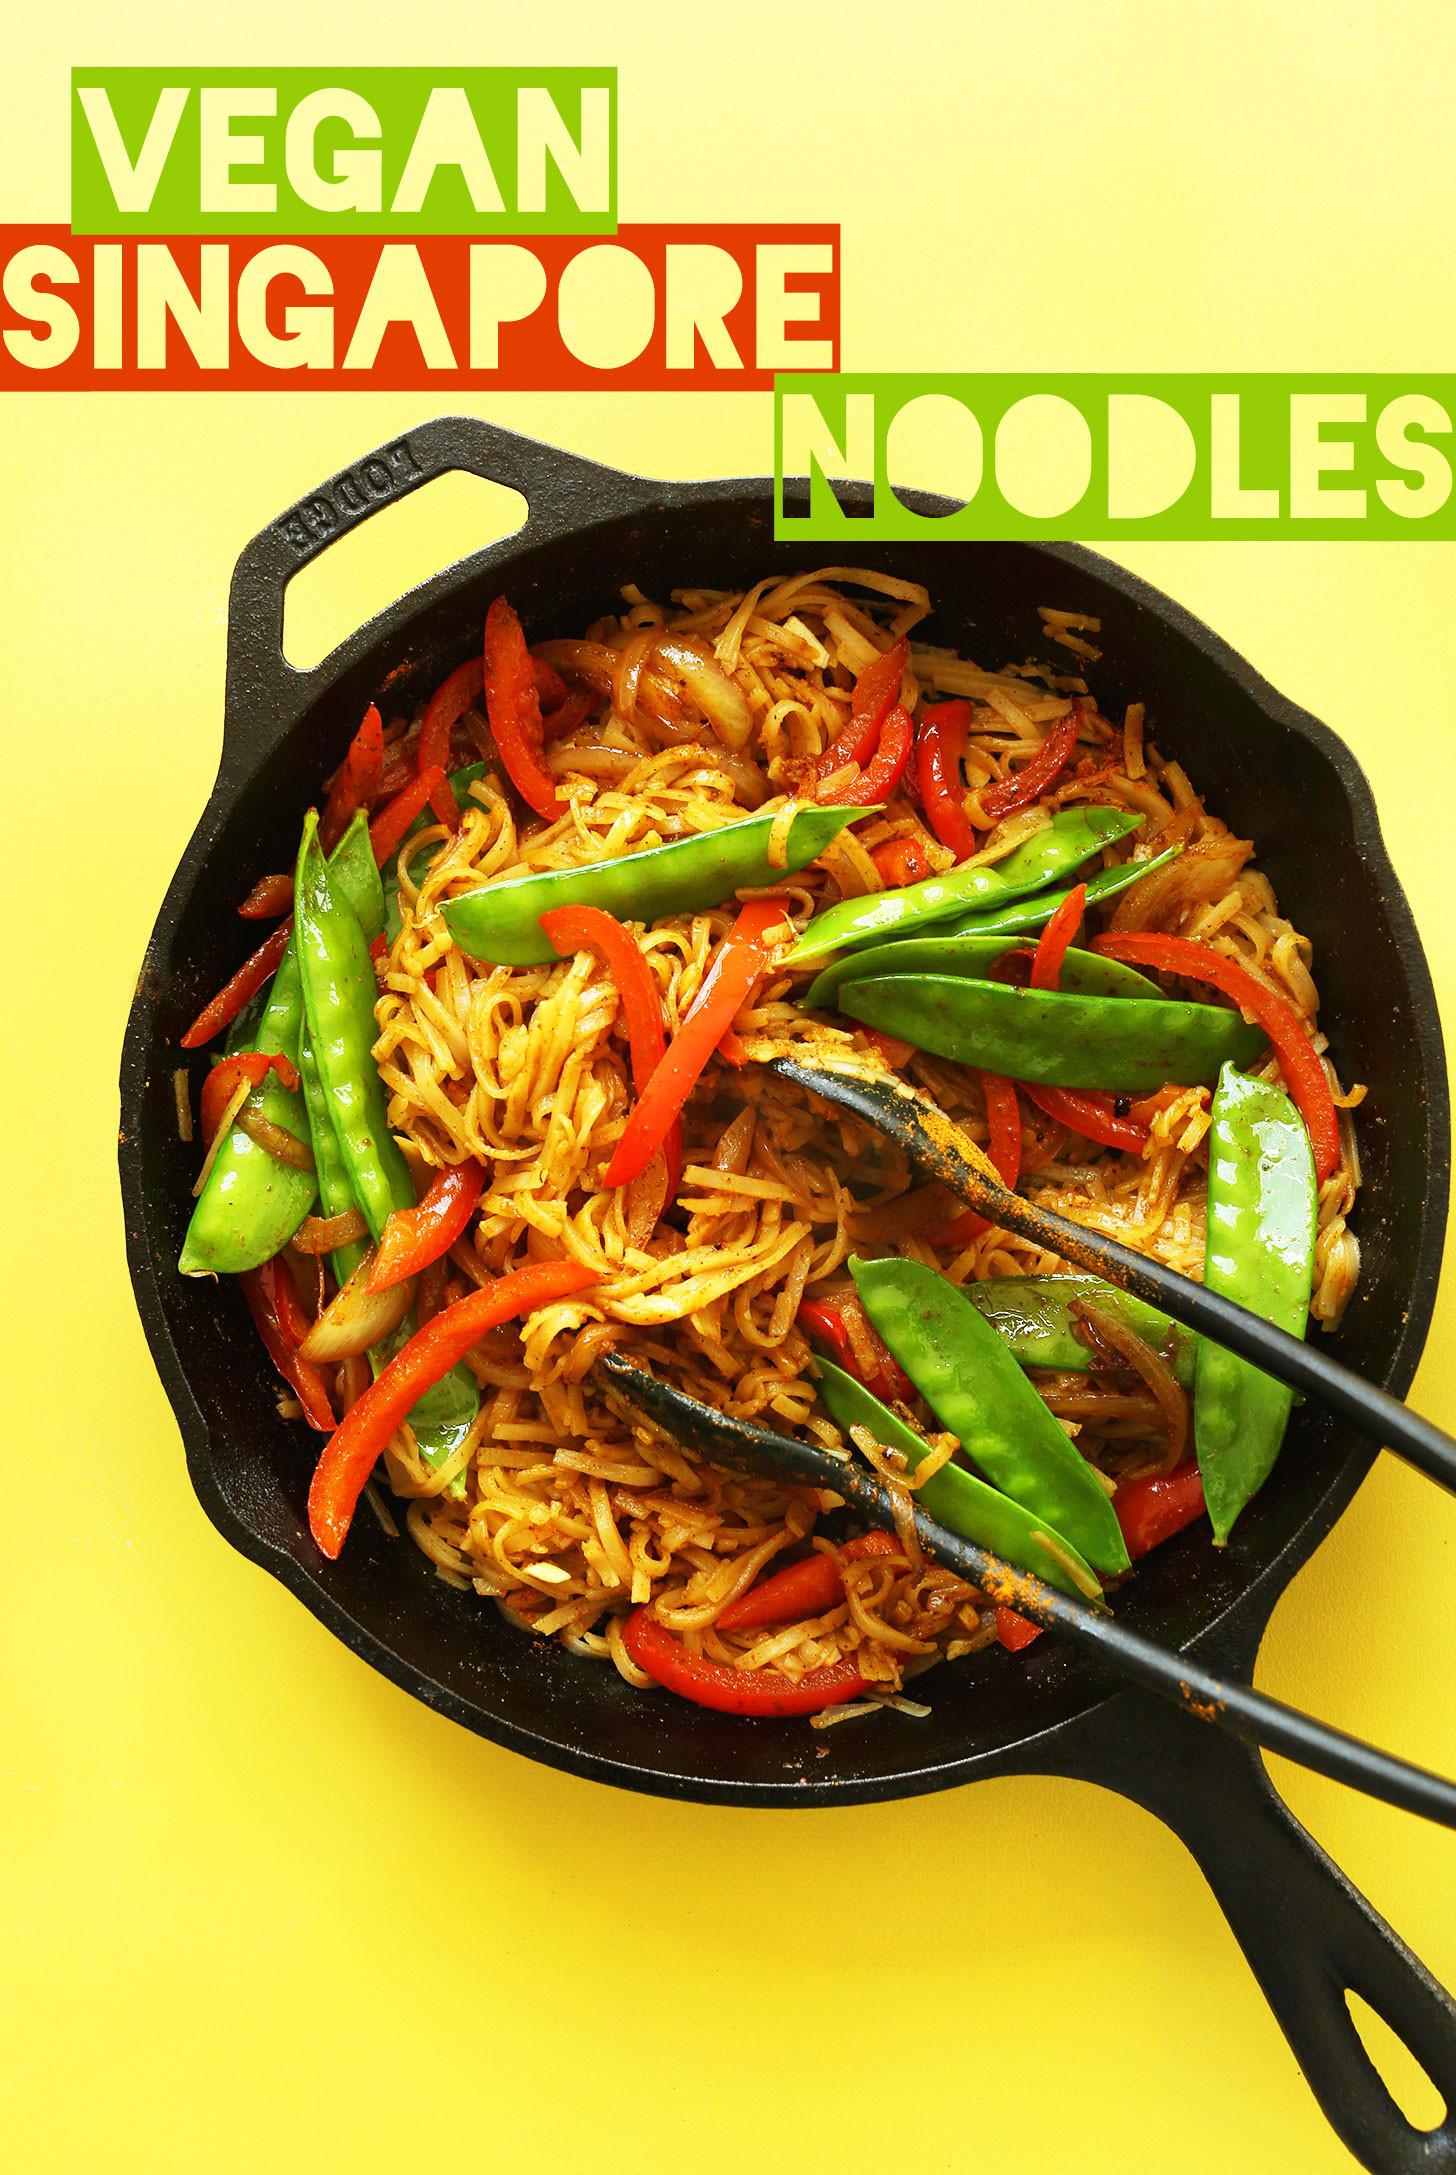 Vegetarian Rice Noodles Recipe  AMAZING Vegan Singapore Noodles 10 ingre nts simple